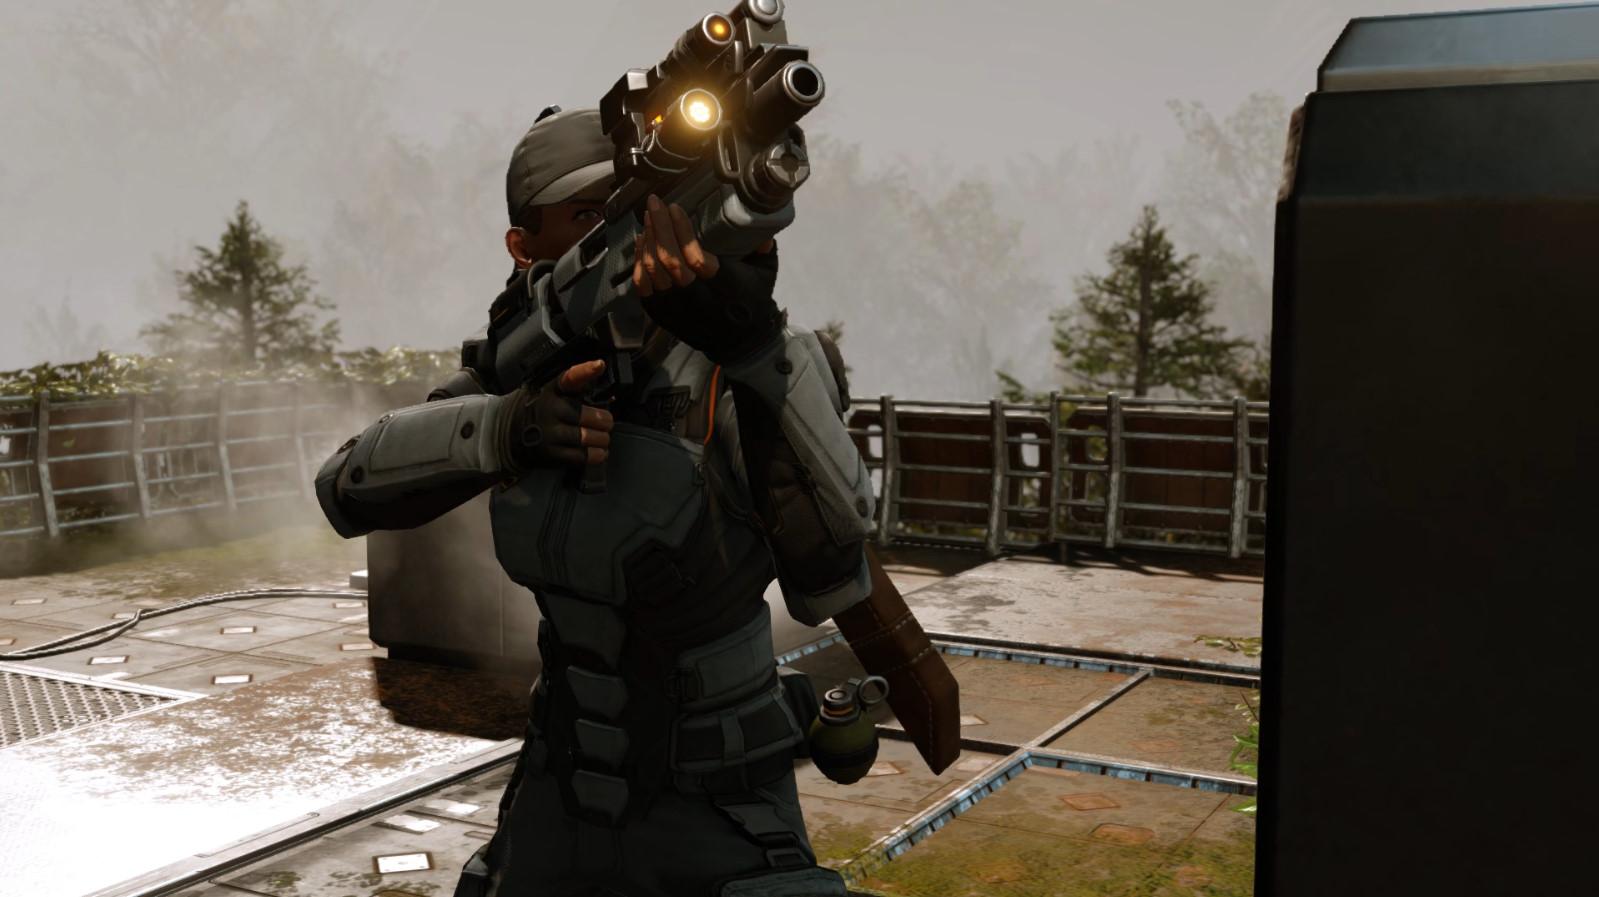 Shotgun.jpg - XCOM 2